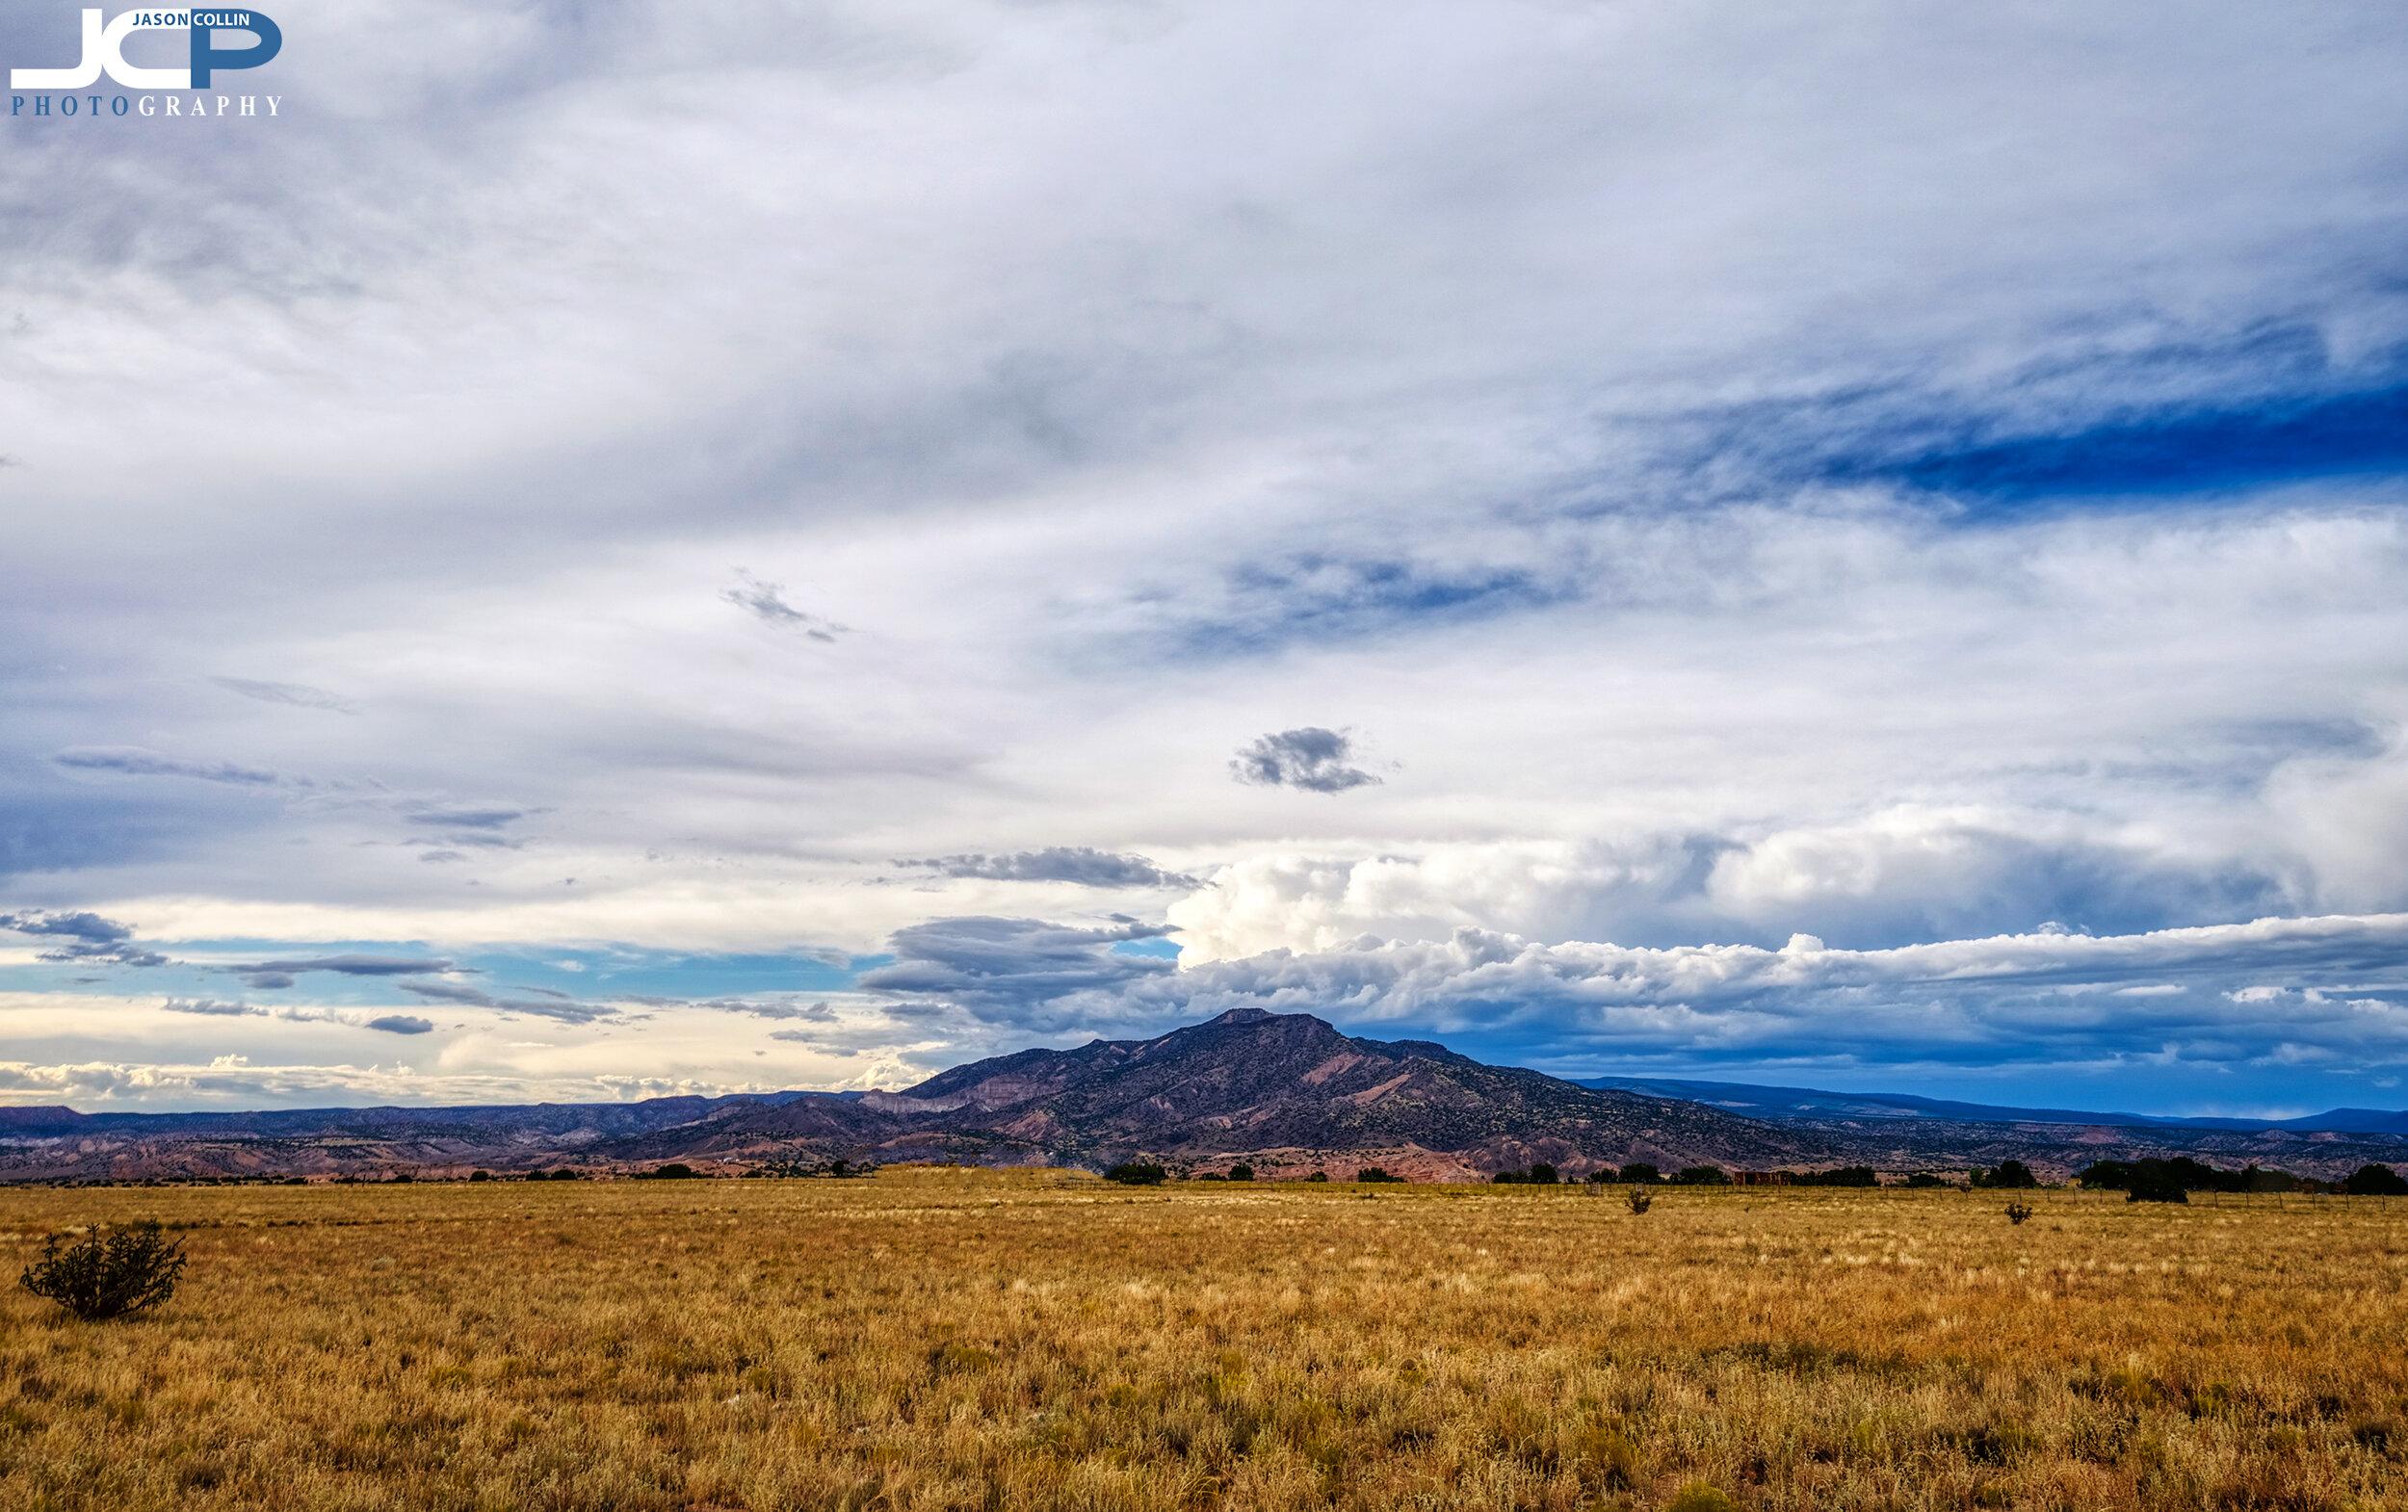 A return to Sierra Negra mountain in Rio Arriba County, New Mexico